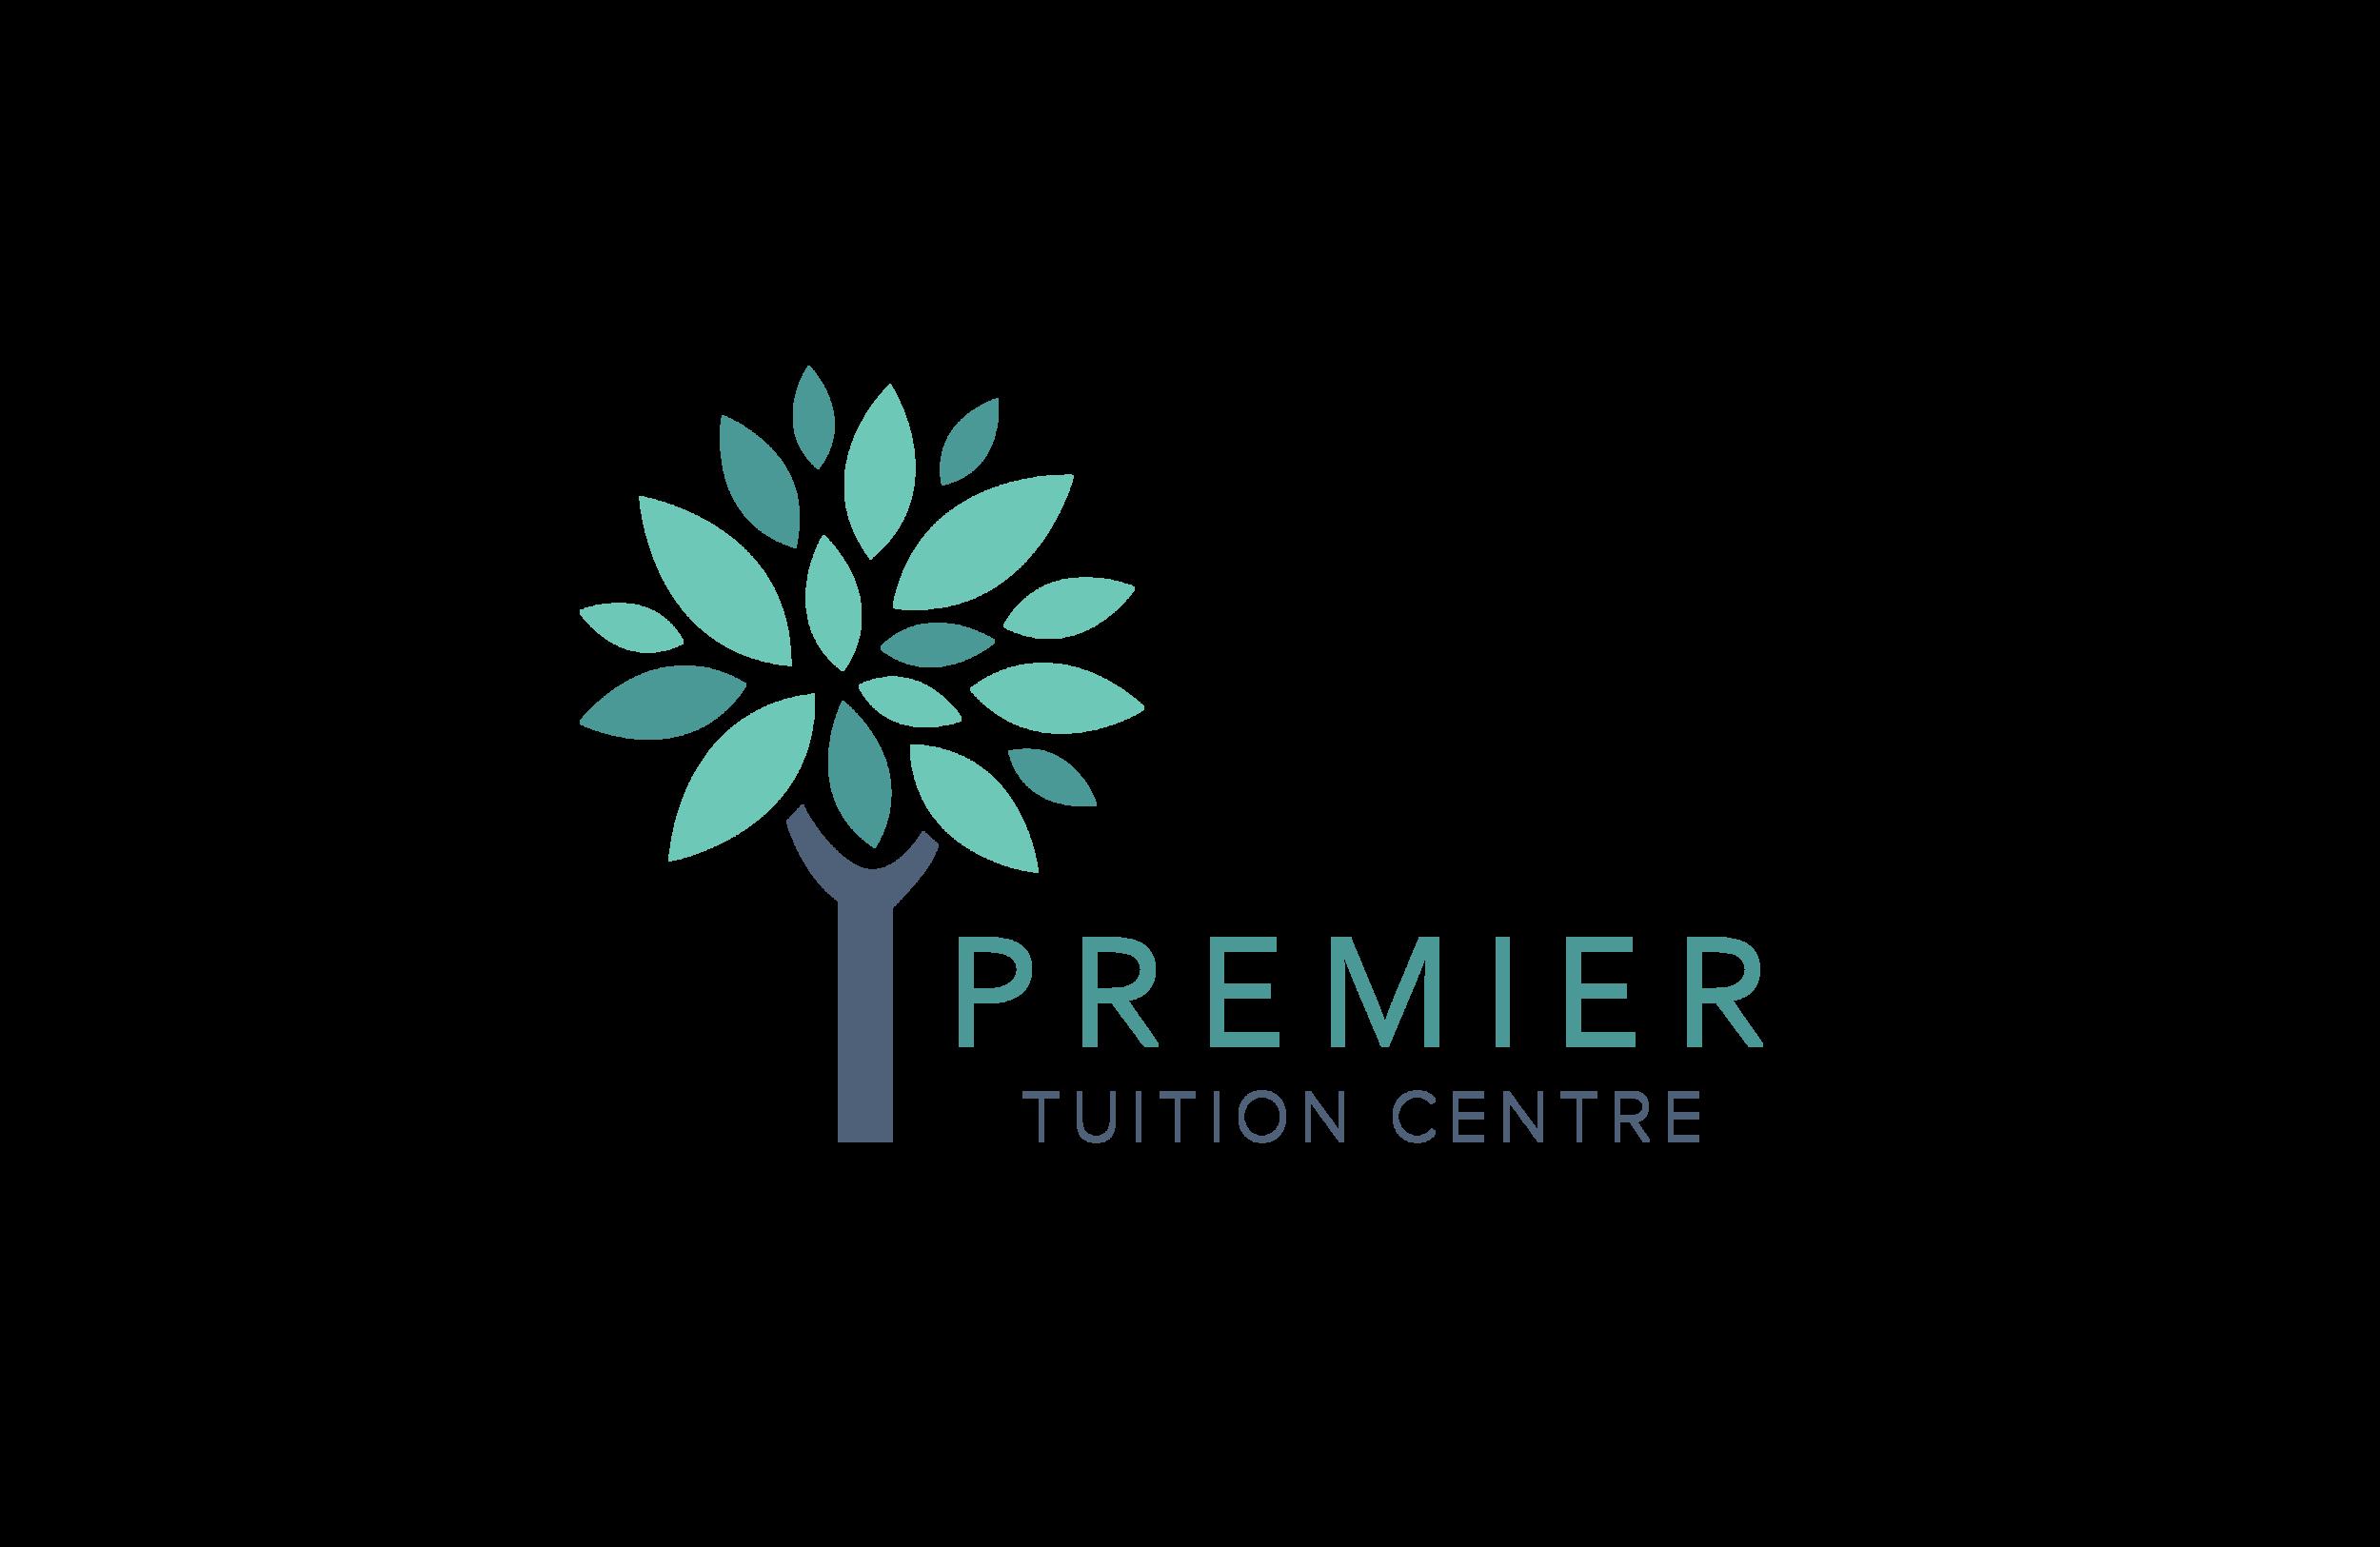 1_Premier Tuition_logo_100x650-01.png